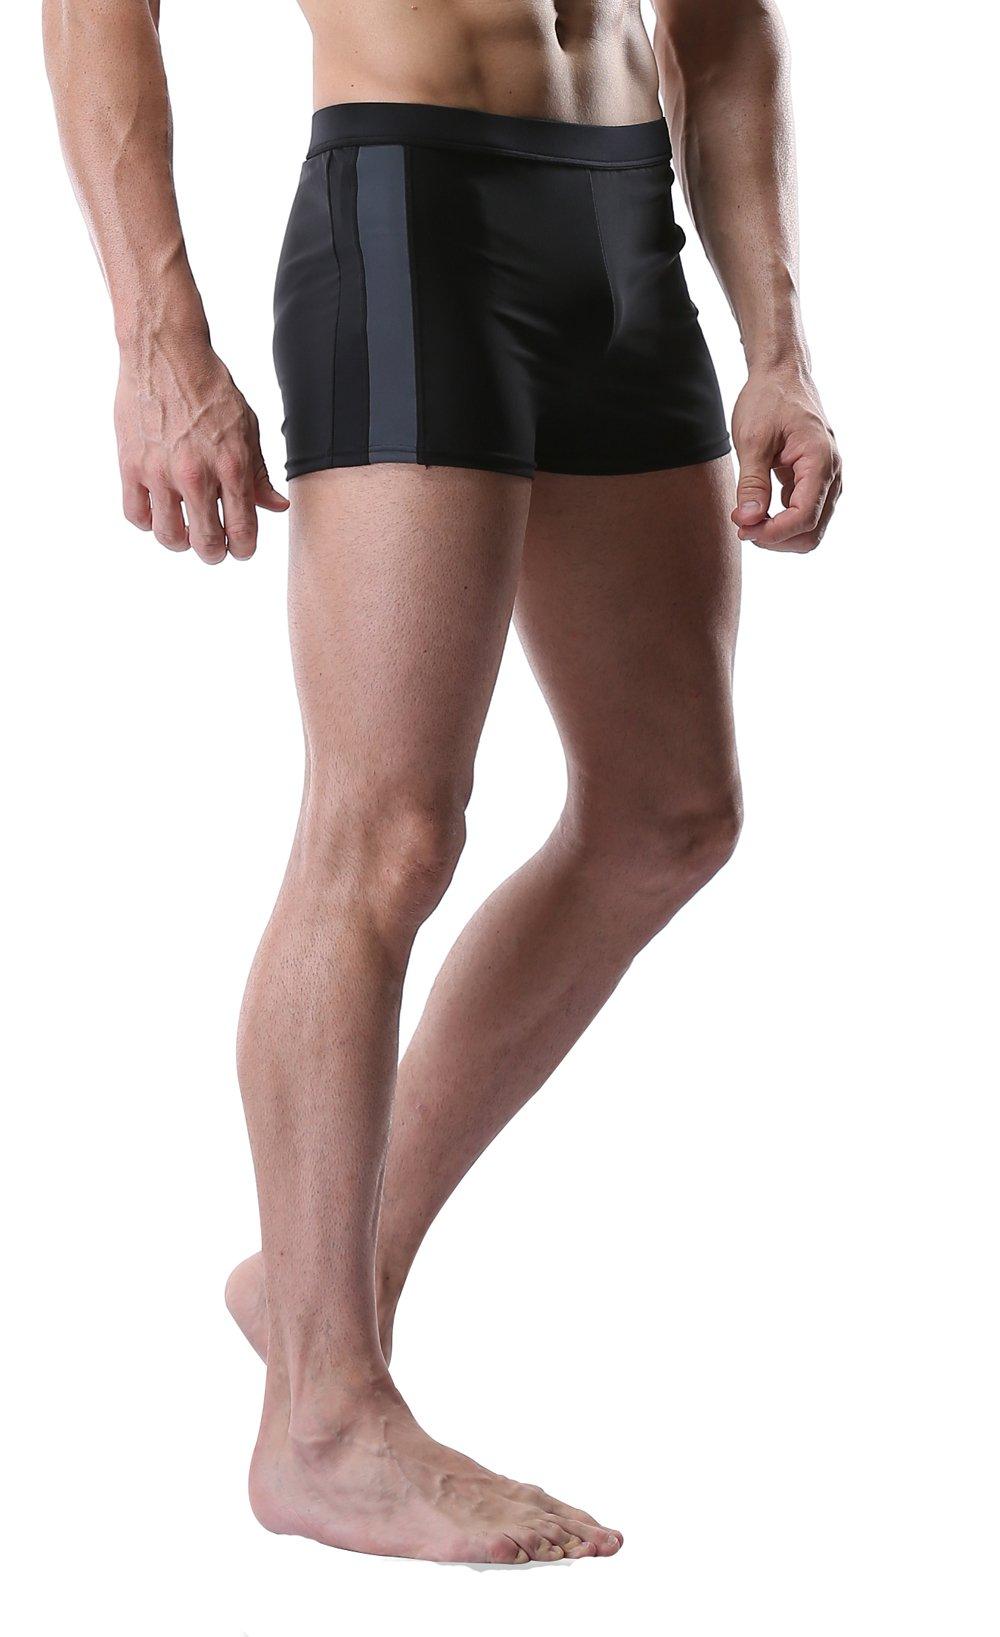 a0de07e80a CharmLeaks Men's Swim Trunk Solid Swimming Brief Swimsuit for Men Fitness  Swimwear product image